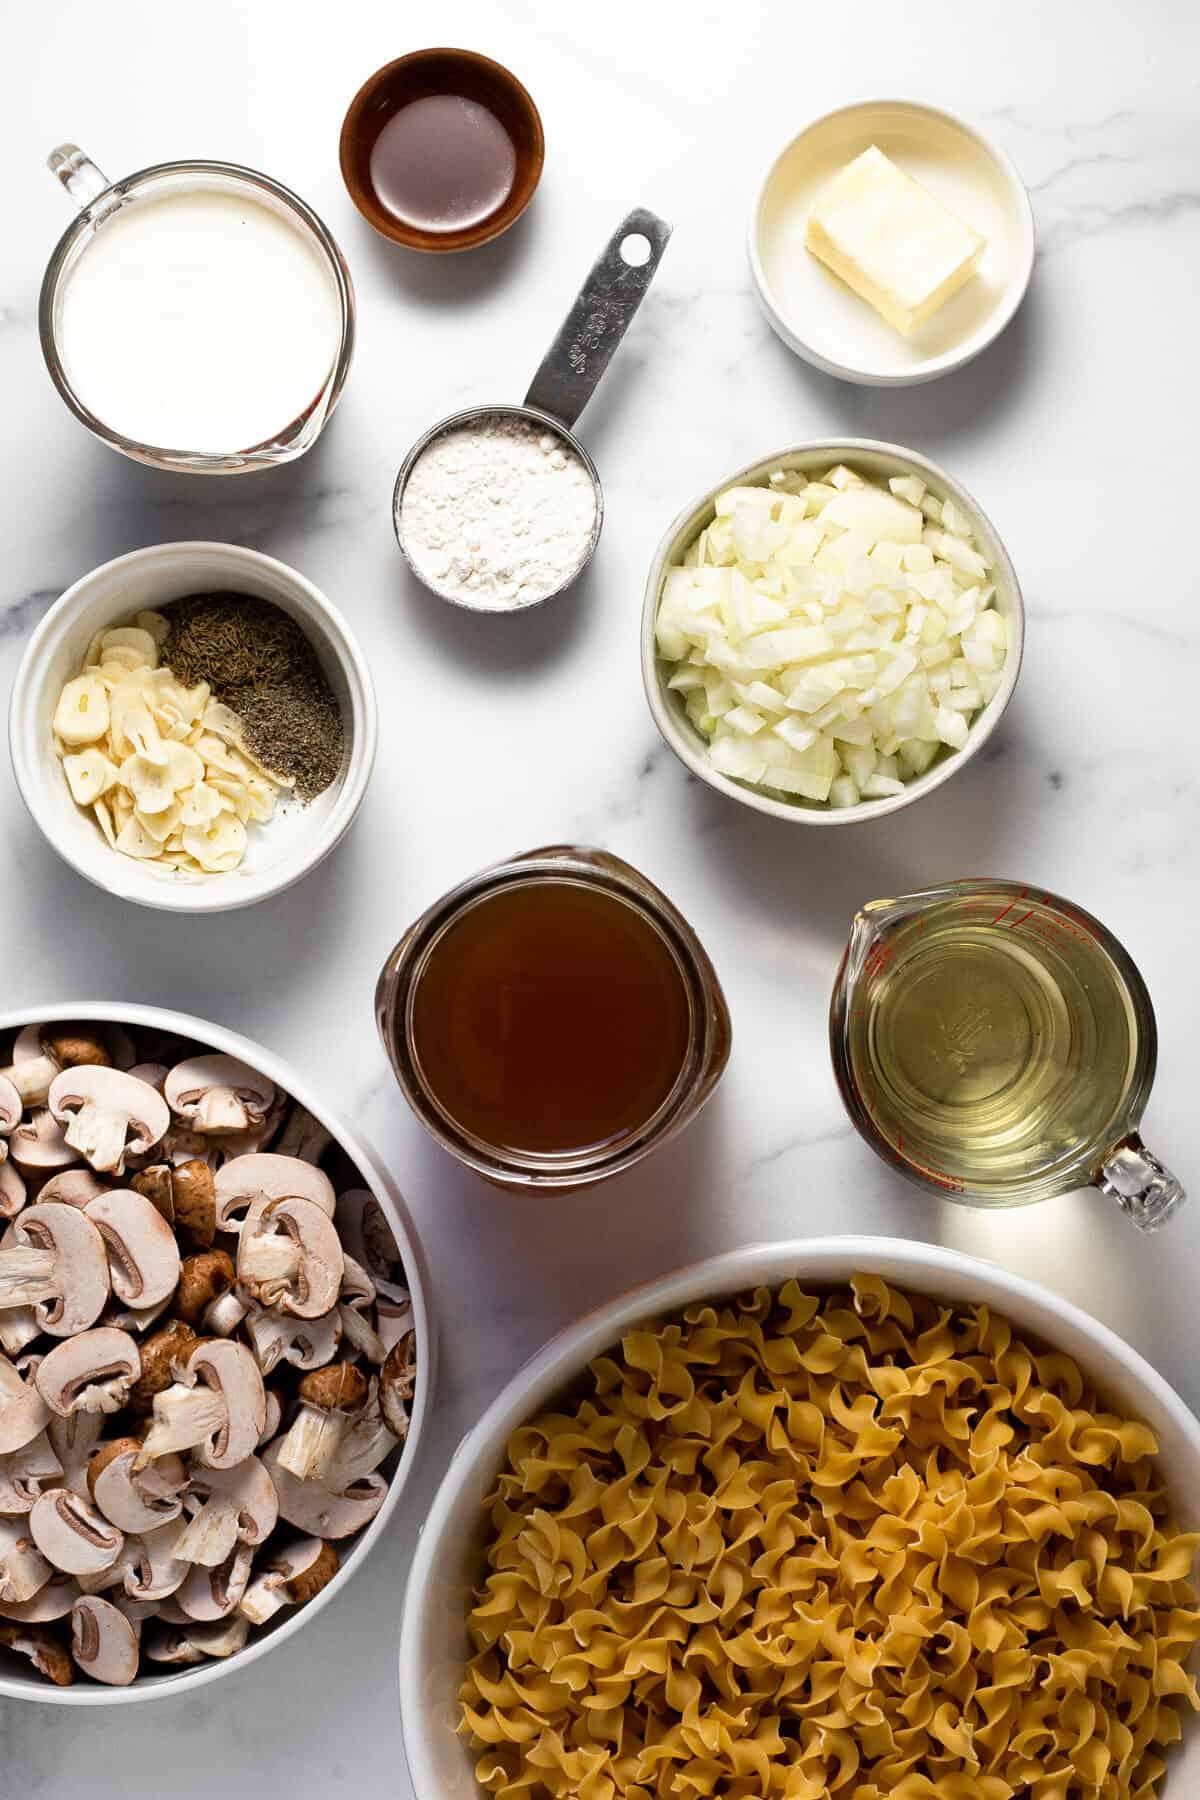 White marble counter top with ingredients to make vegetarian mushroom stroganoff